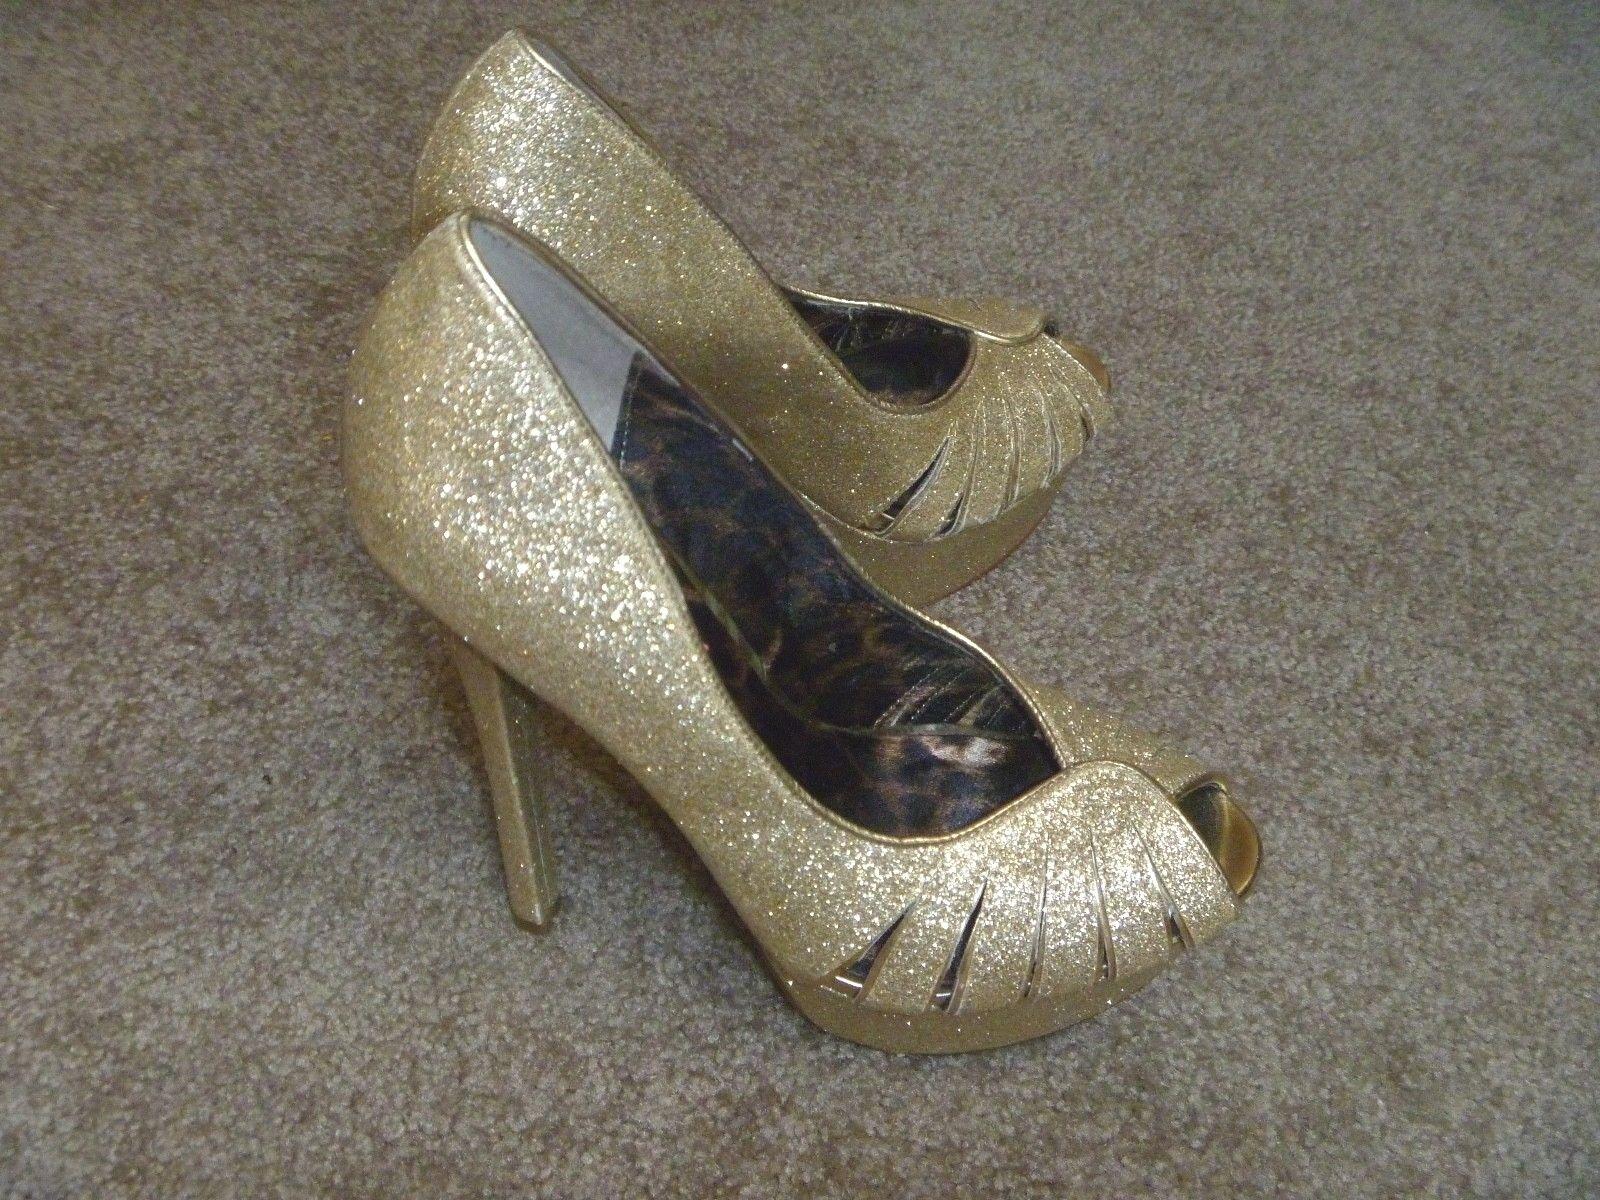 BETSEY JOHNSON BREANN-G gold Glittery Peep Toe Stiletto Heels shoes Sz 6